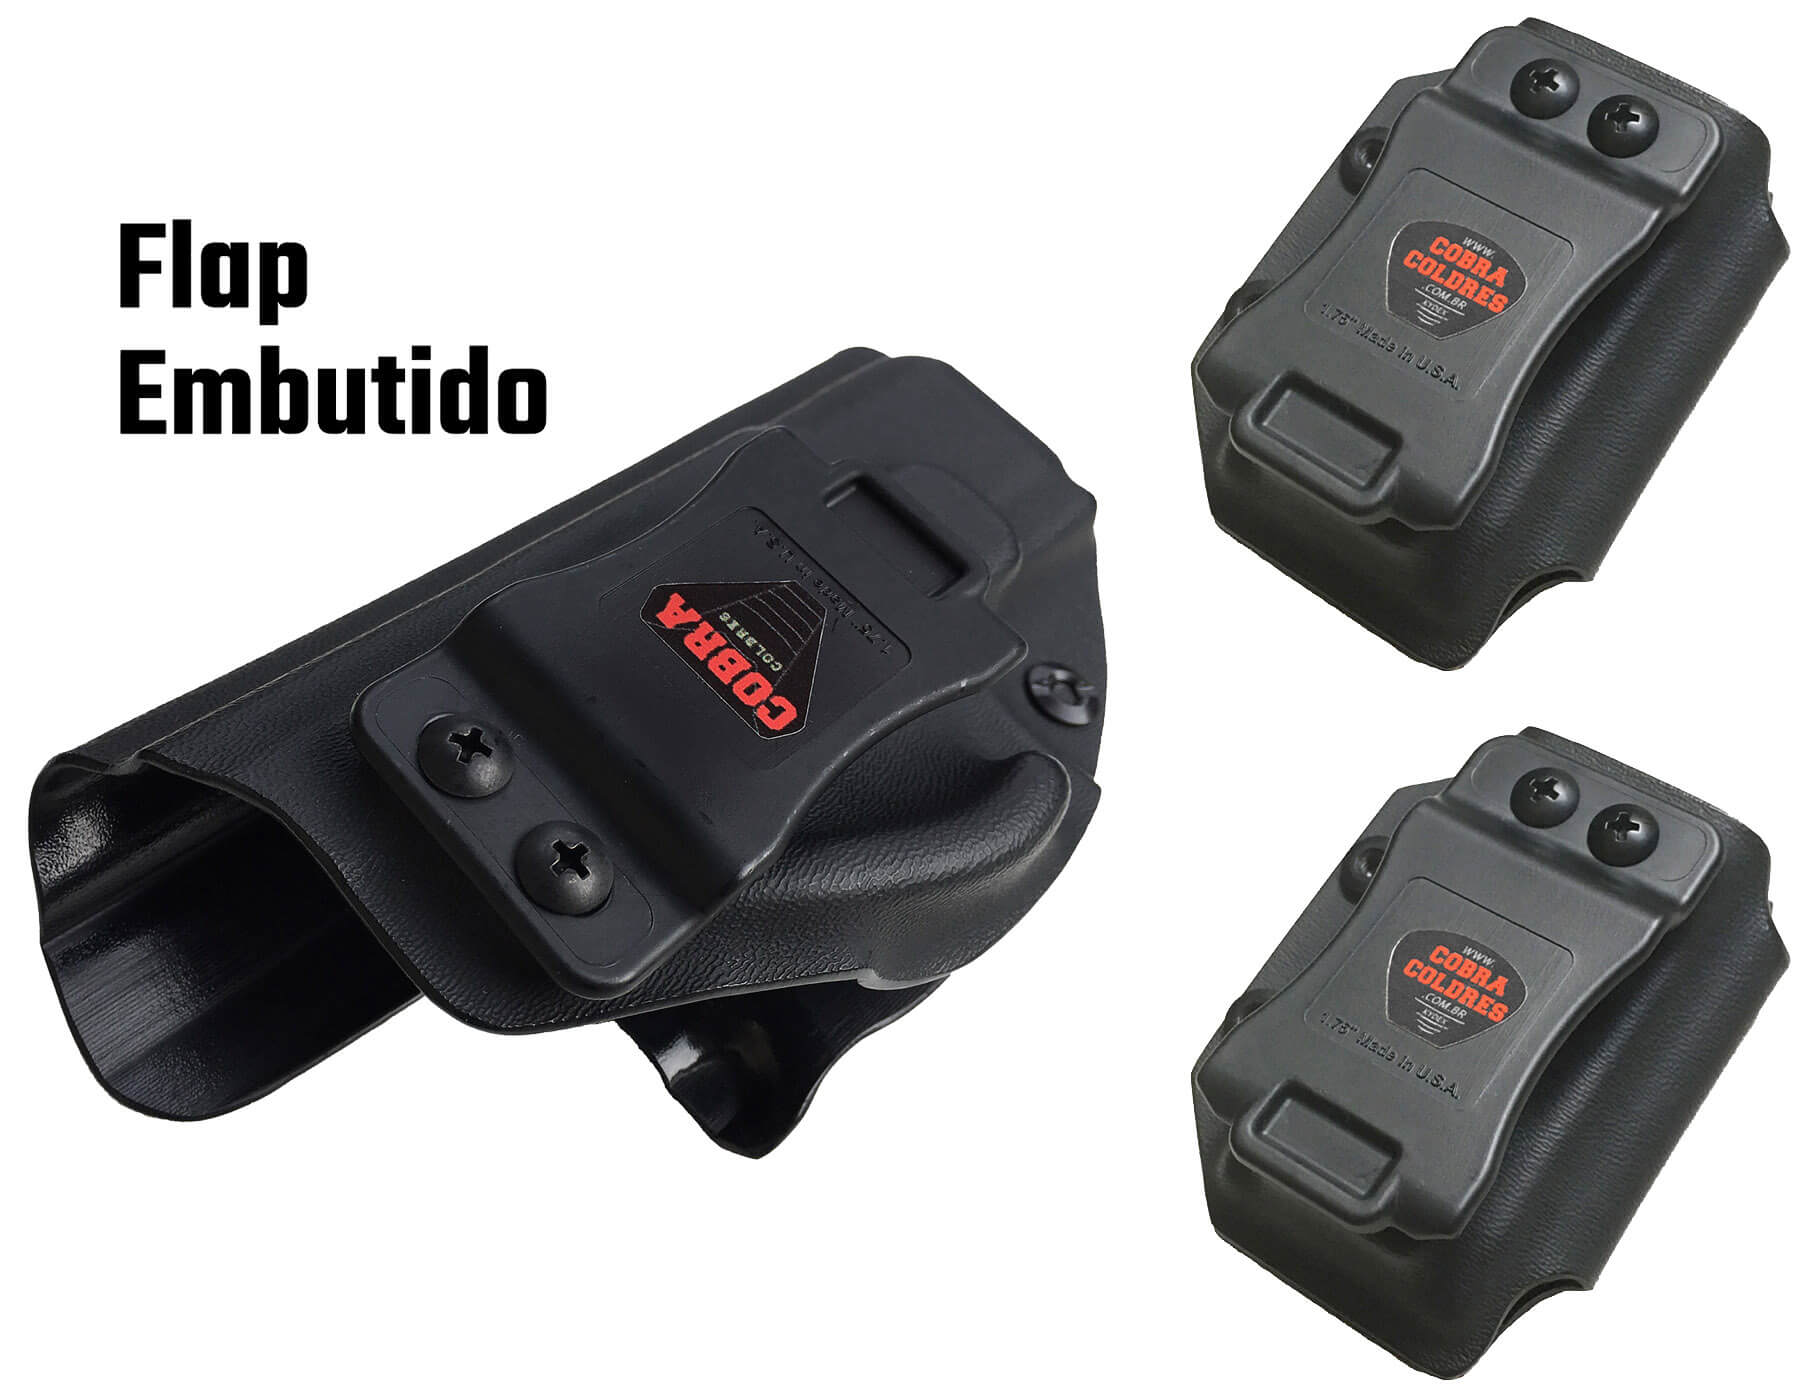 Coldre [G2c .40] Kydex Com Flap + 2 Porta-Carregadores Saque Rápido Velado Kydex®